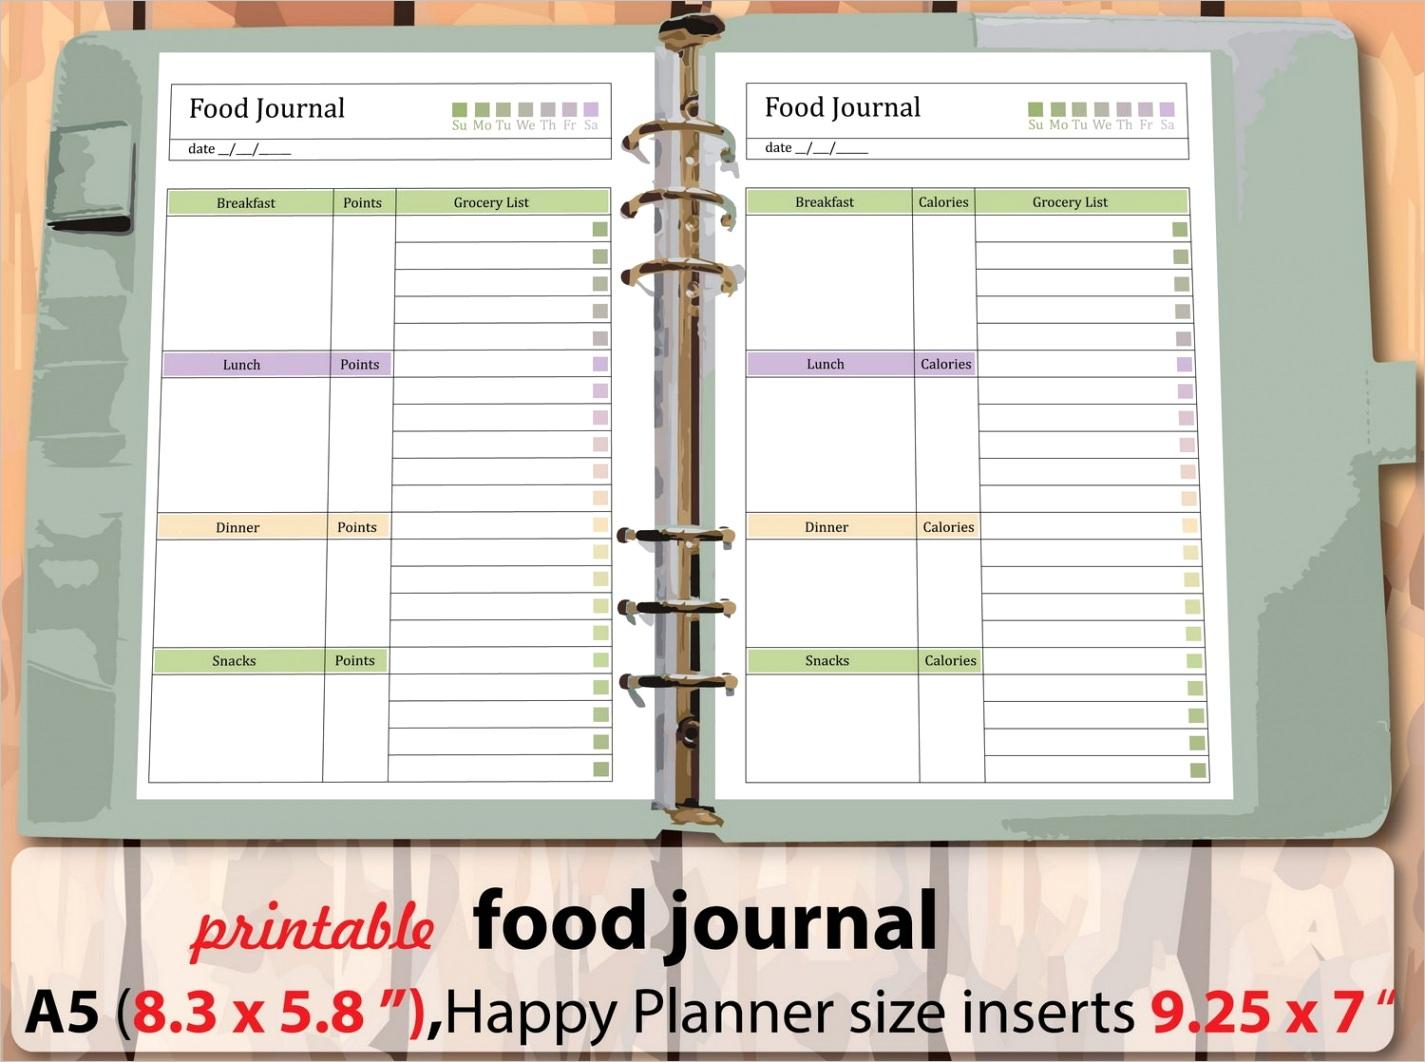 easy t plan printable food journal